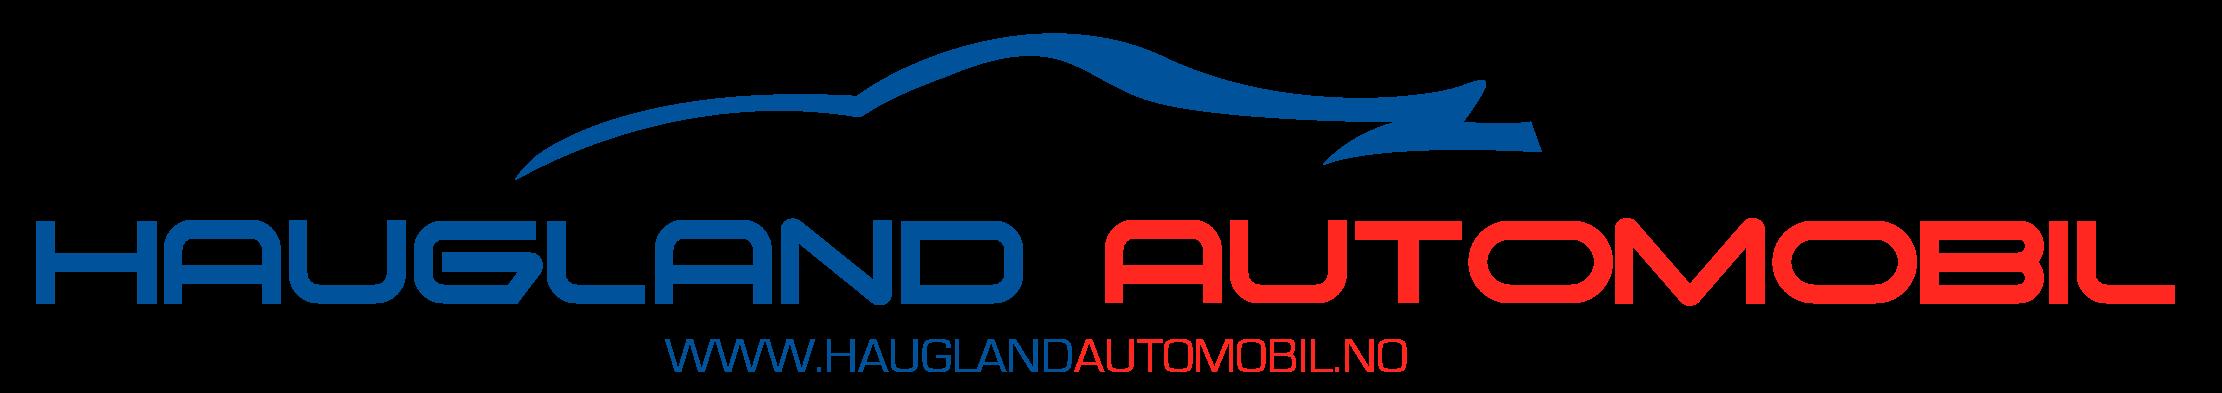 Haugland Automobil